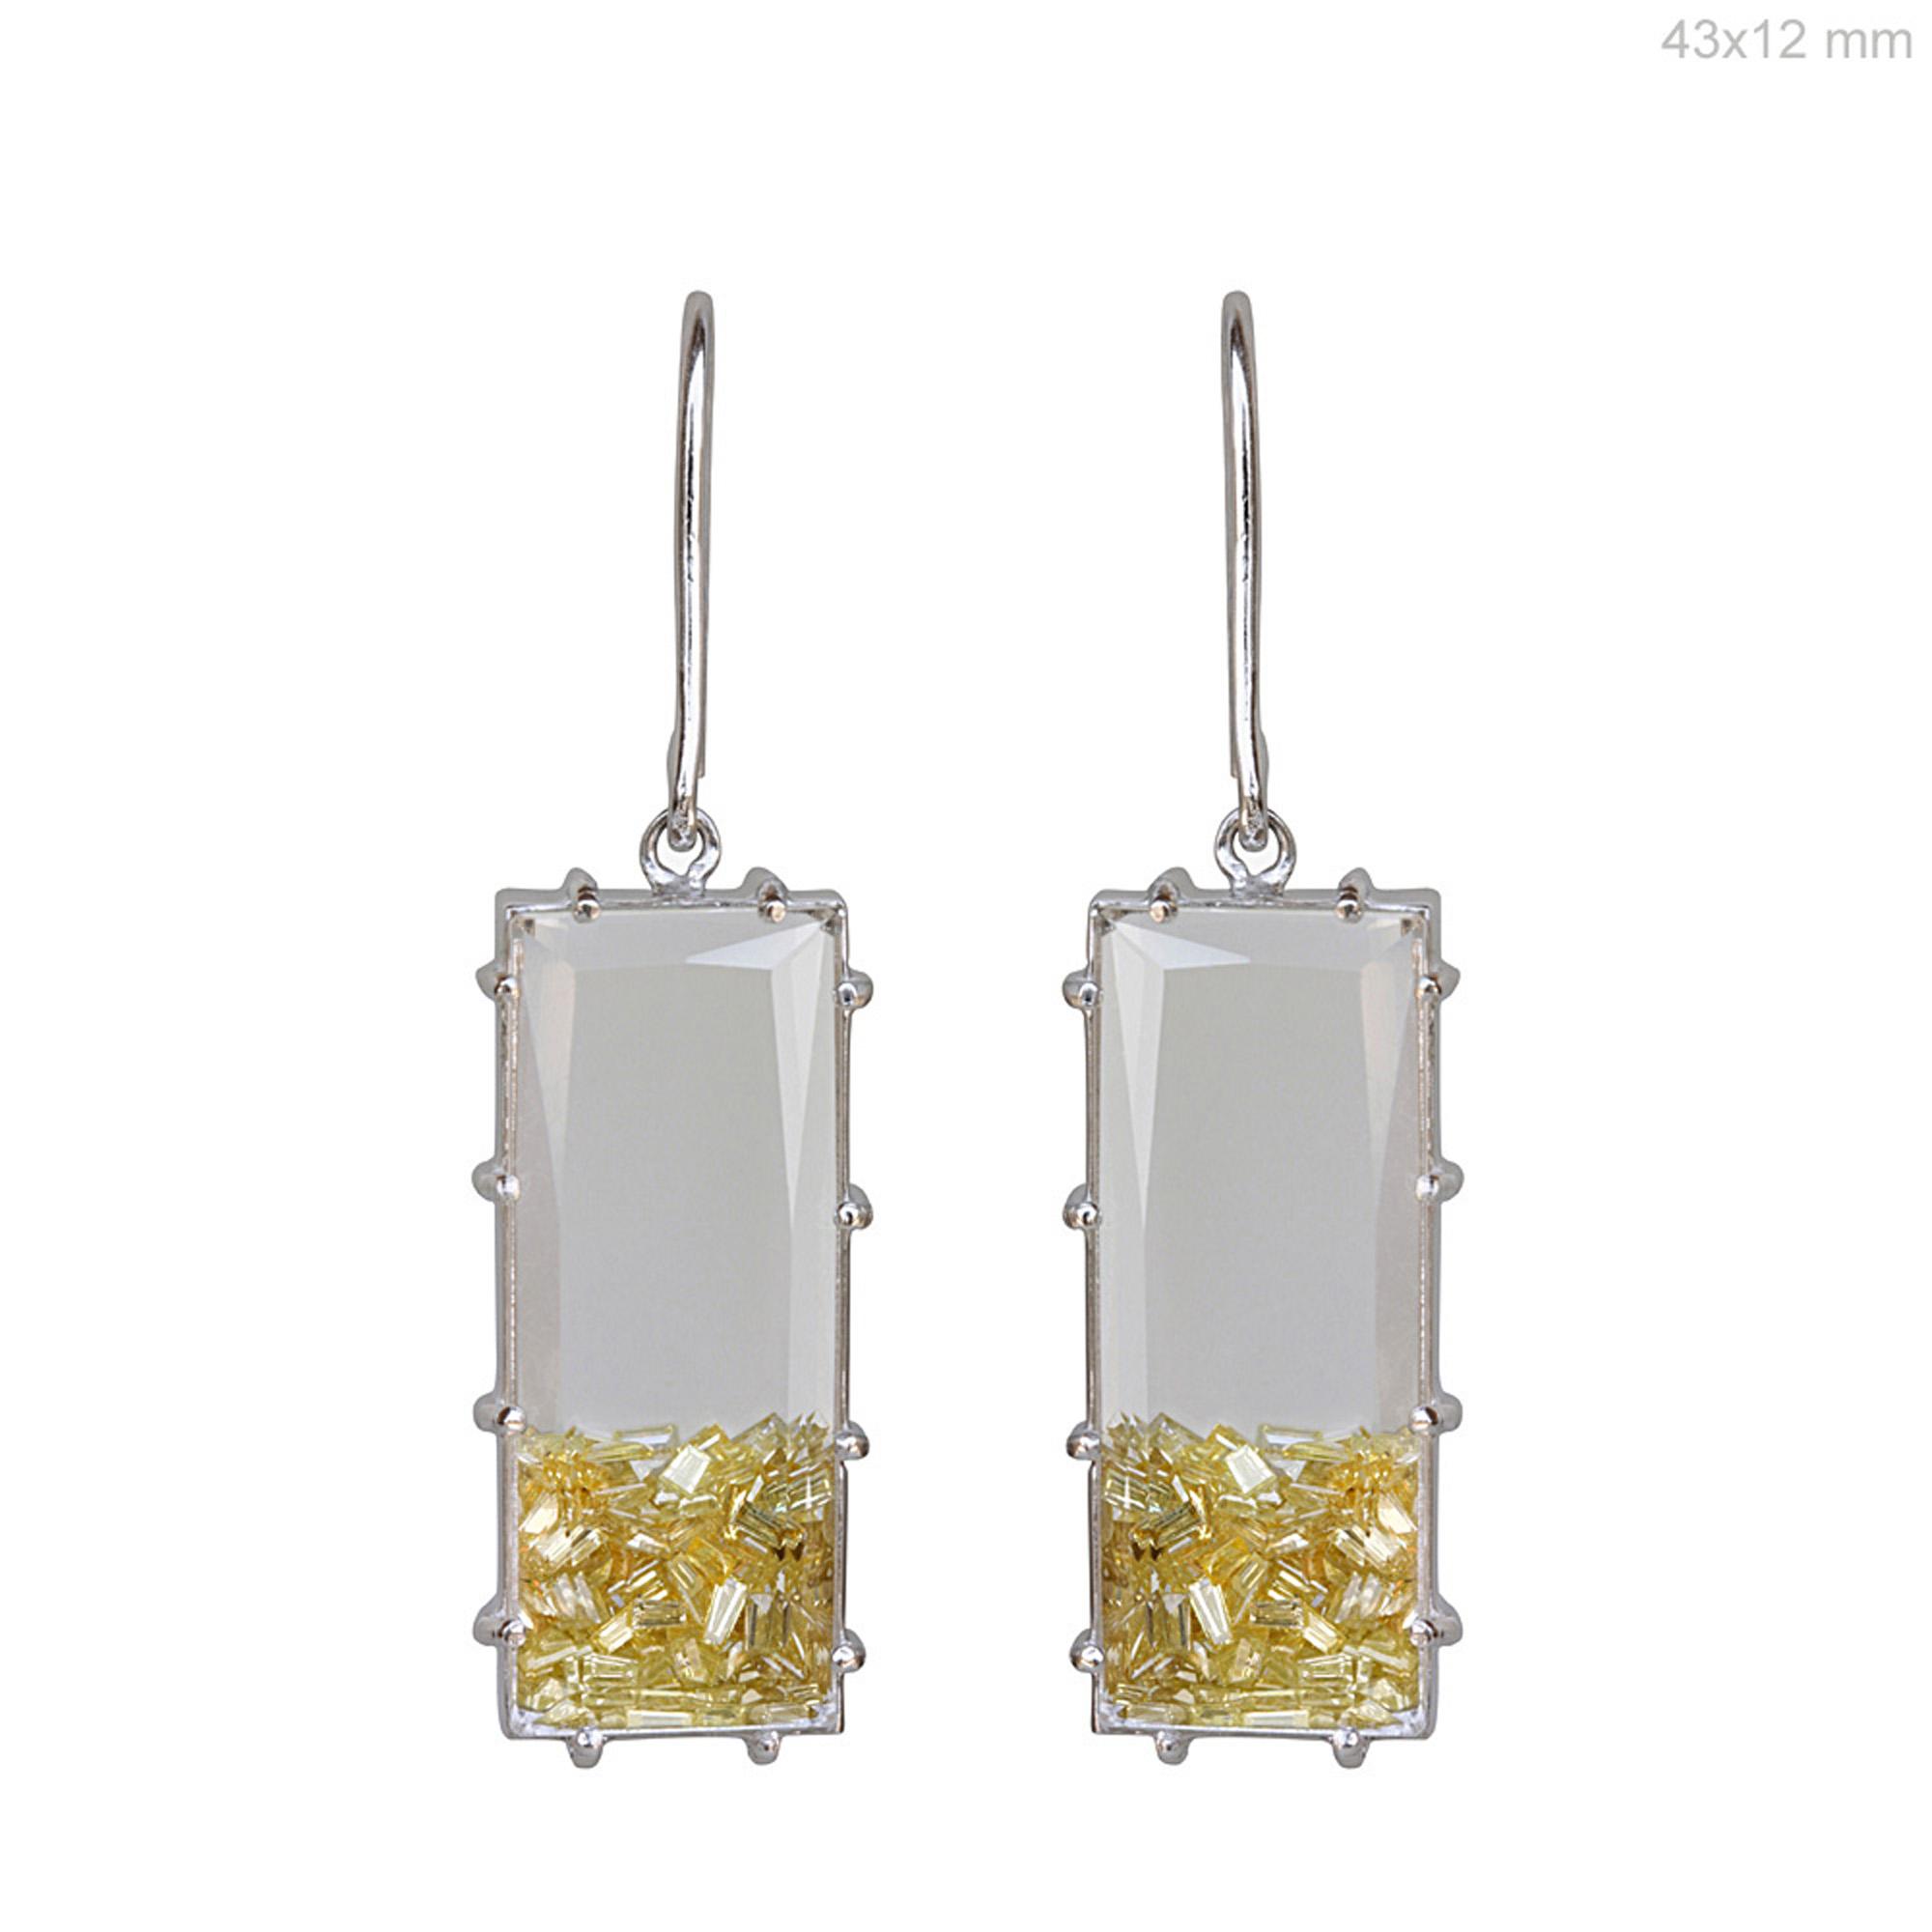 18k gold real diamond crystal dangle hook shaker earrings